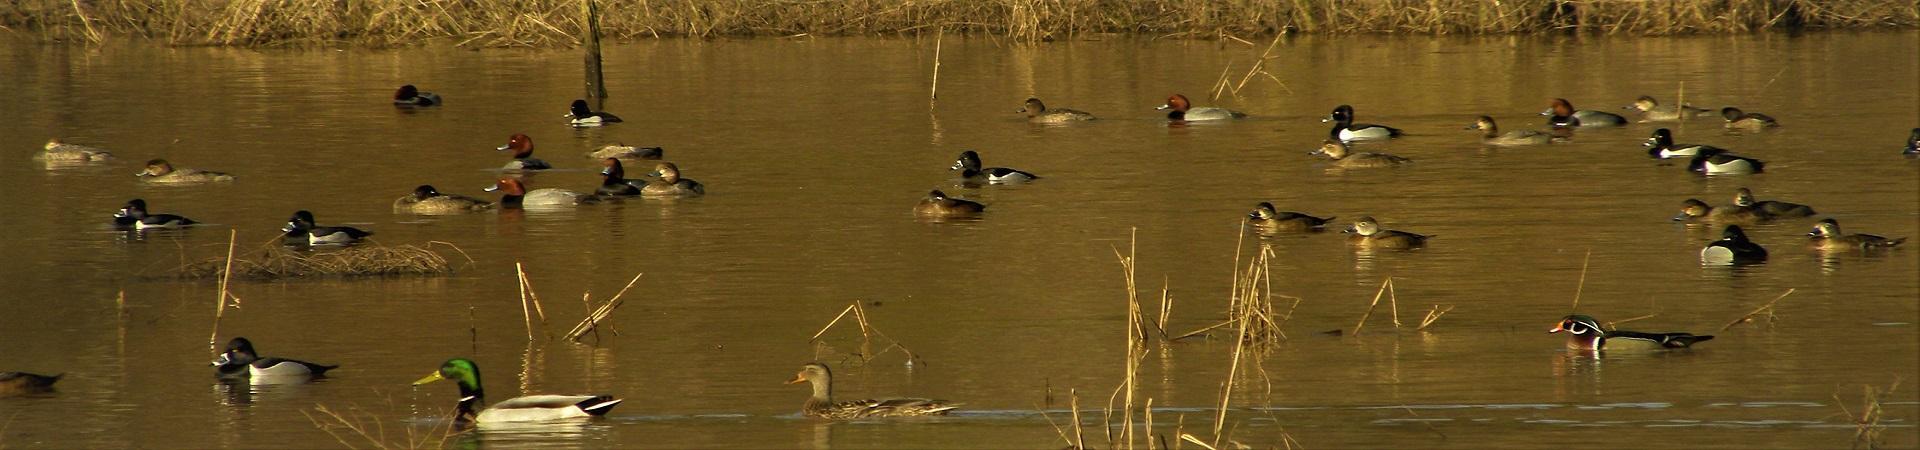 ducks on water at Rum Creek WMA